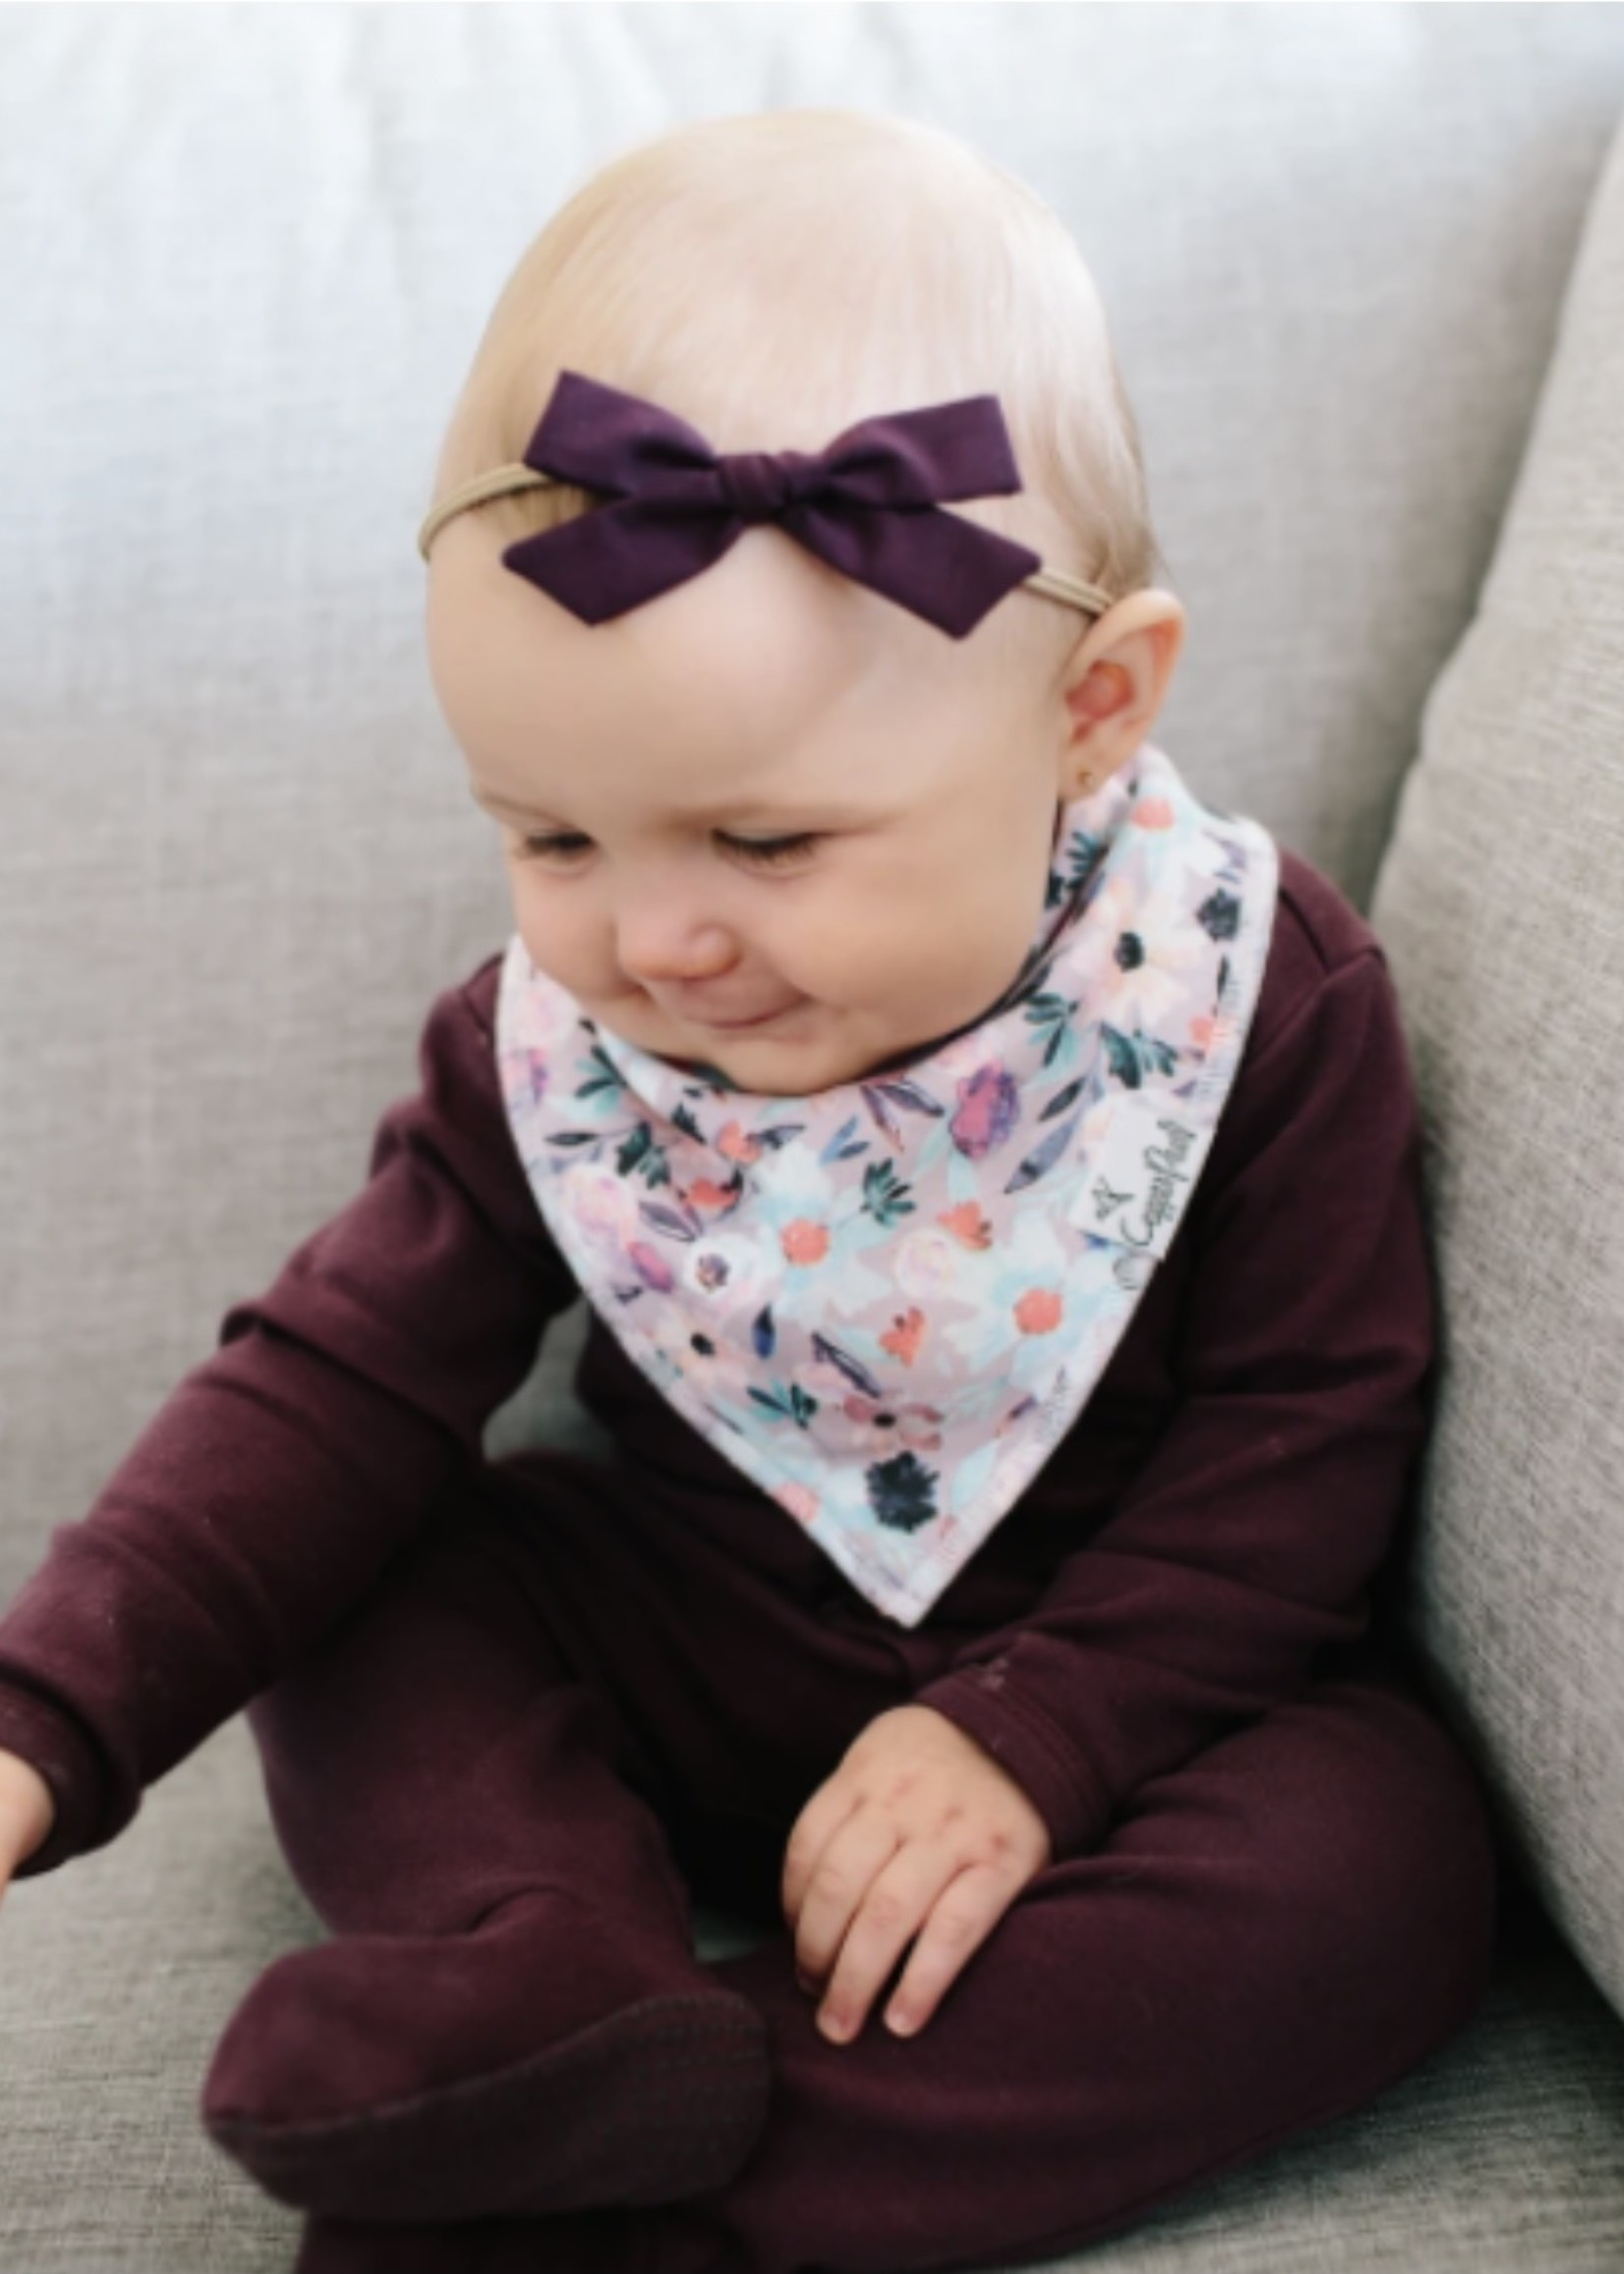 COPPER PEARL 4-Pack Baby Bandana Bibs MORGAN